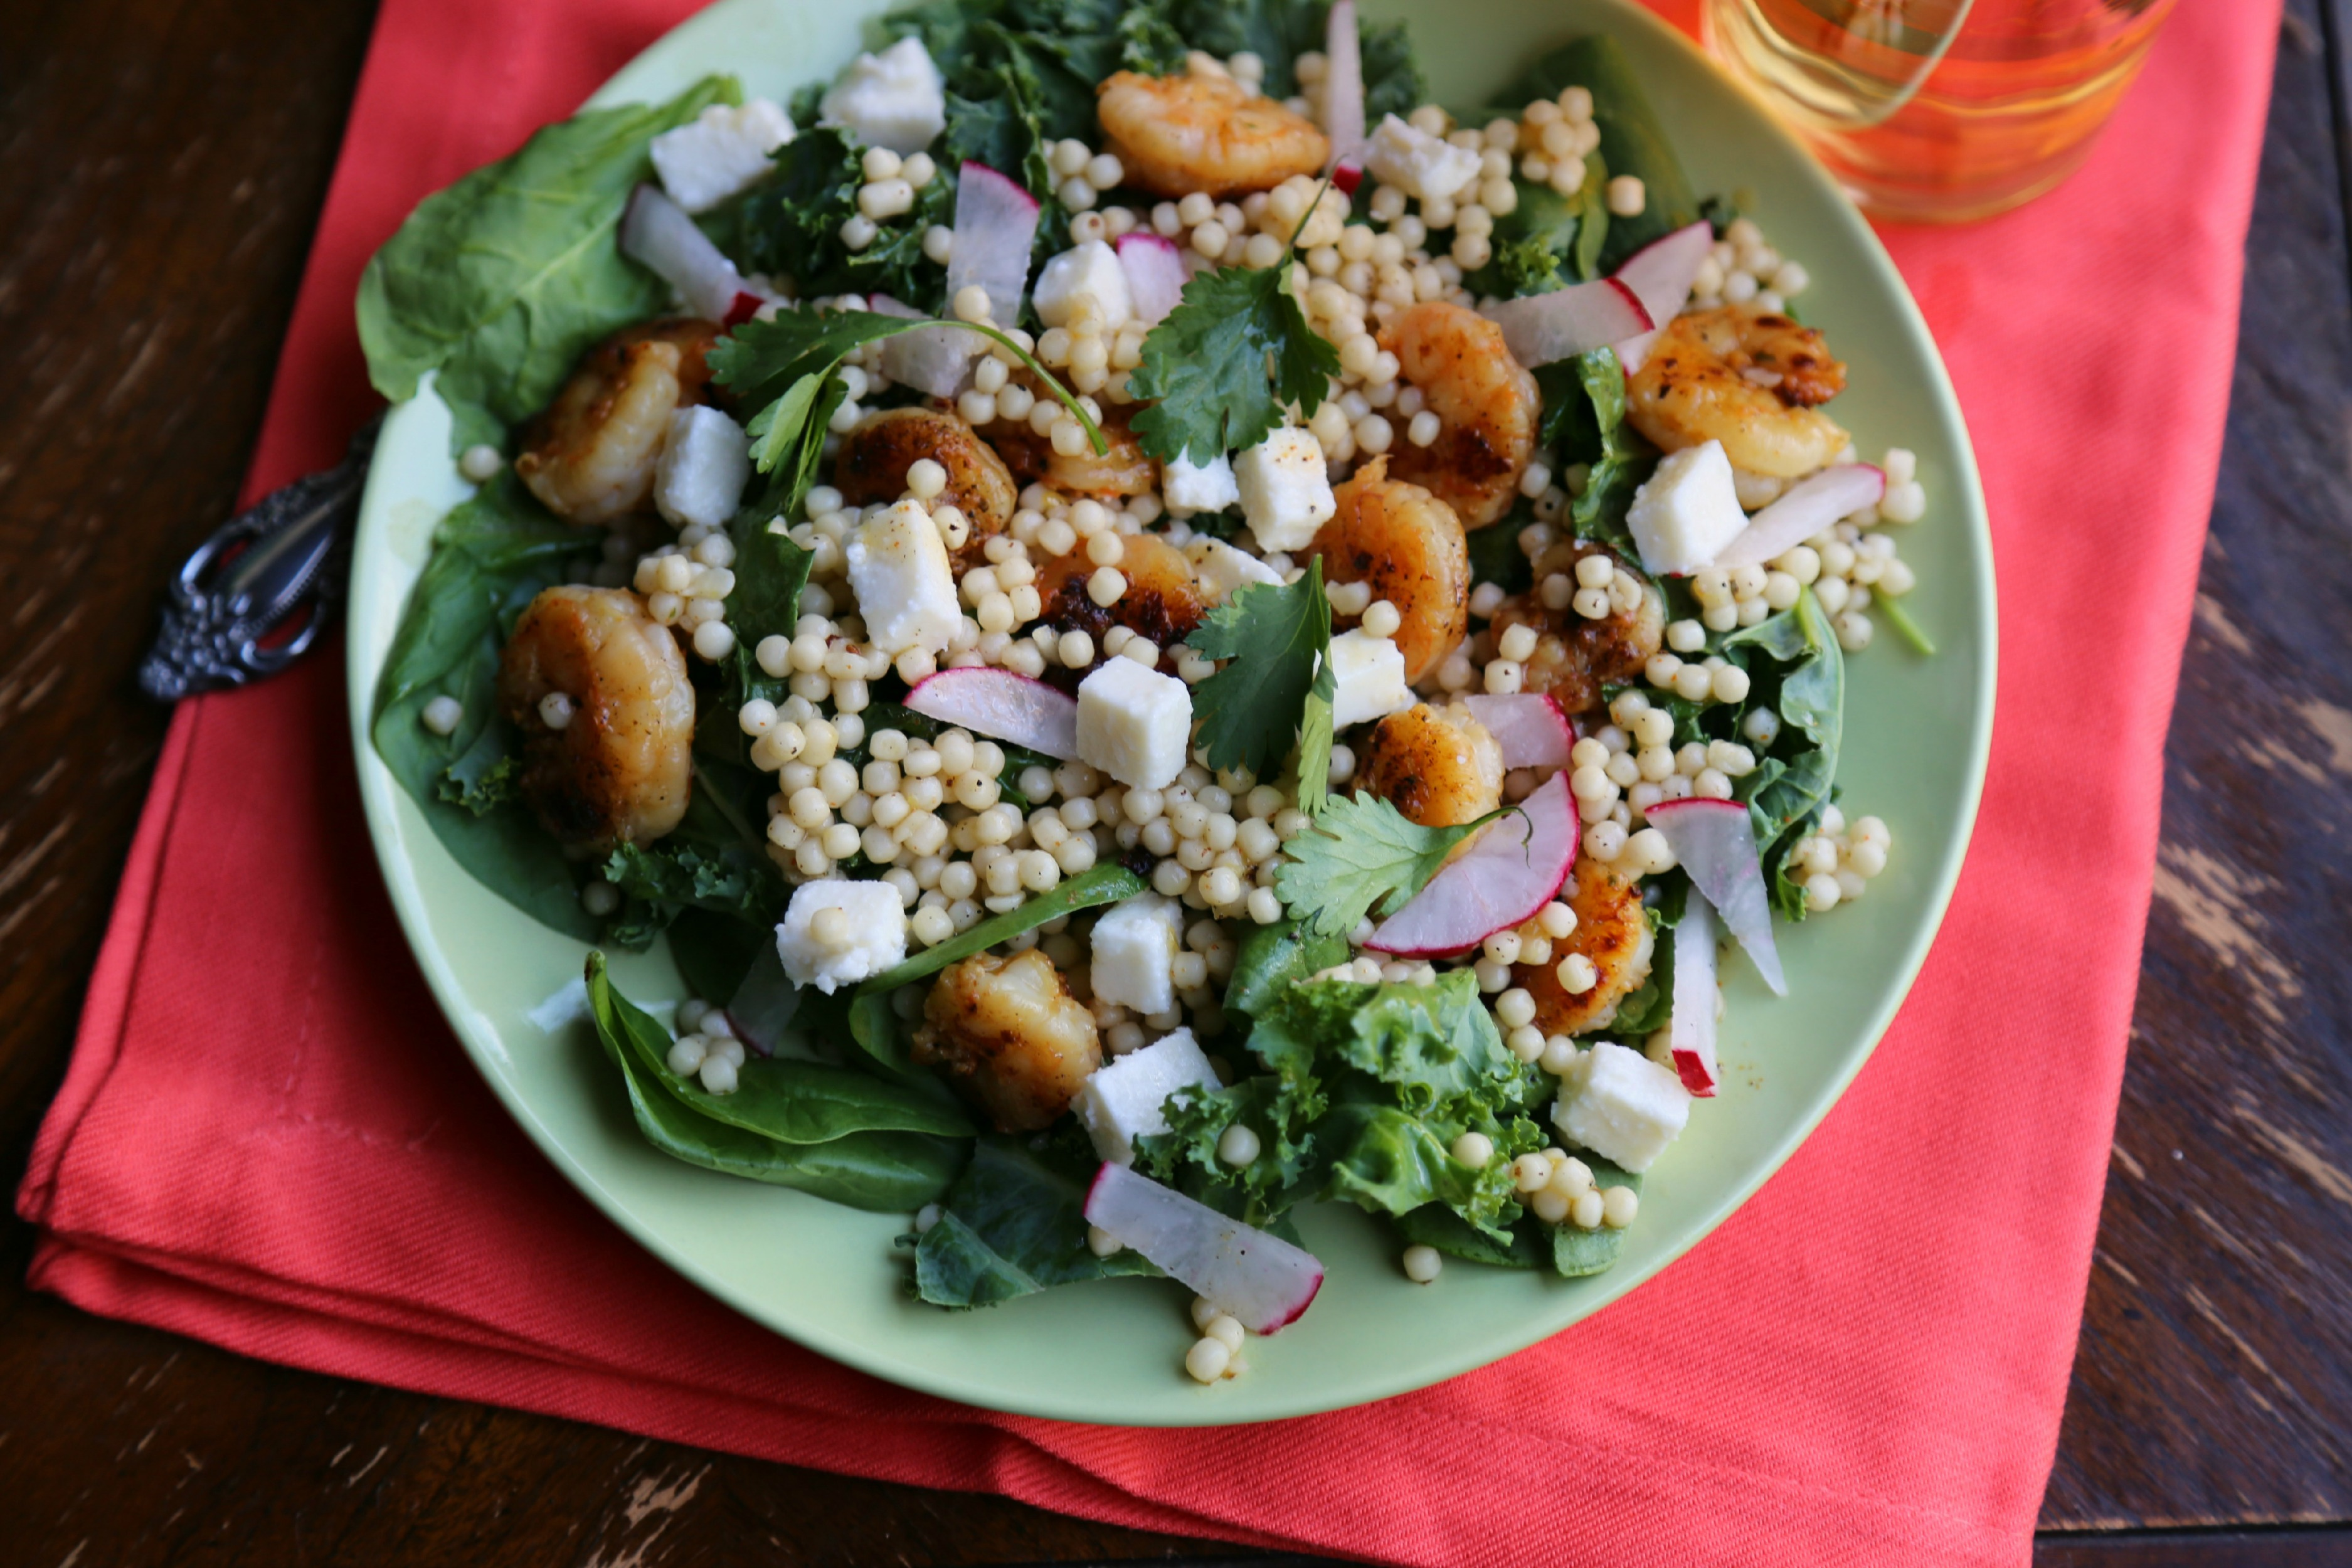 roasted-shrimp-couscous-salad-VianneyRodriguez-sweetlifebake